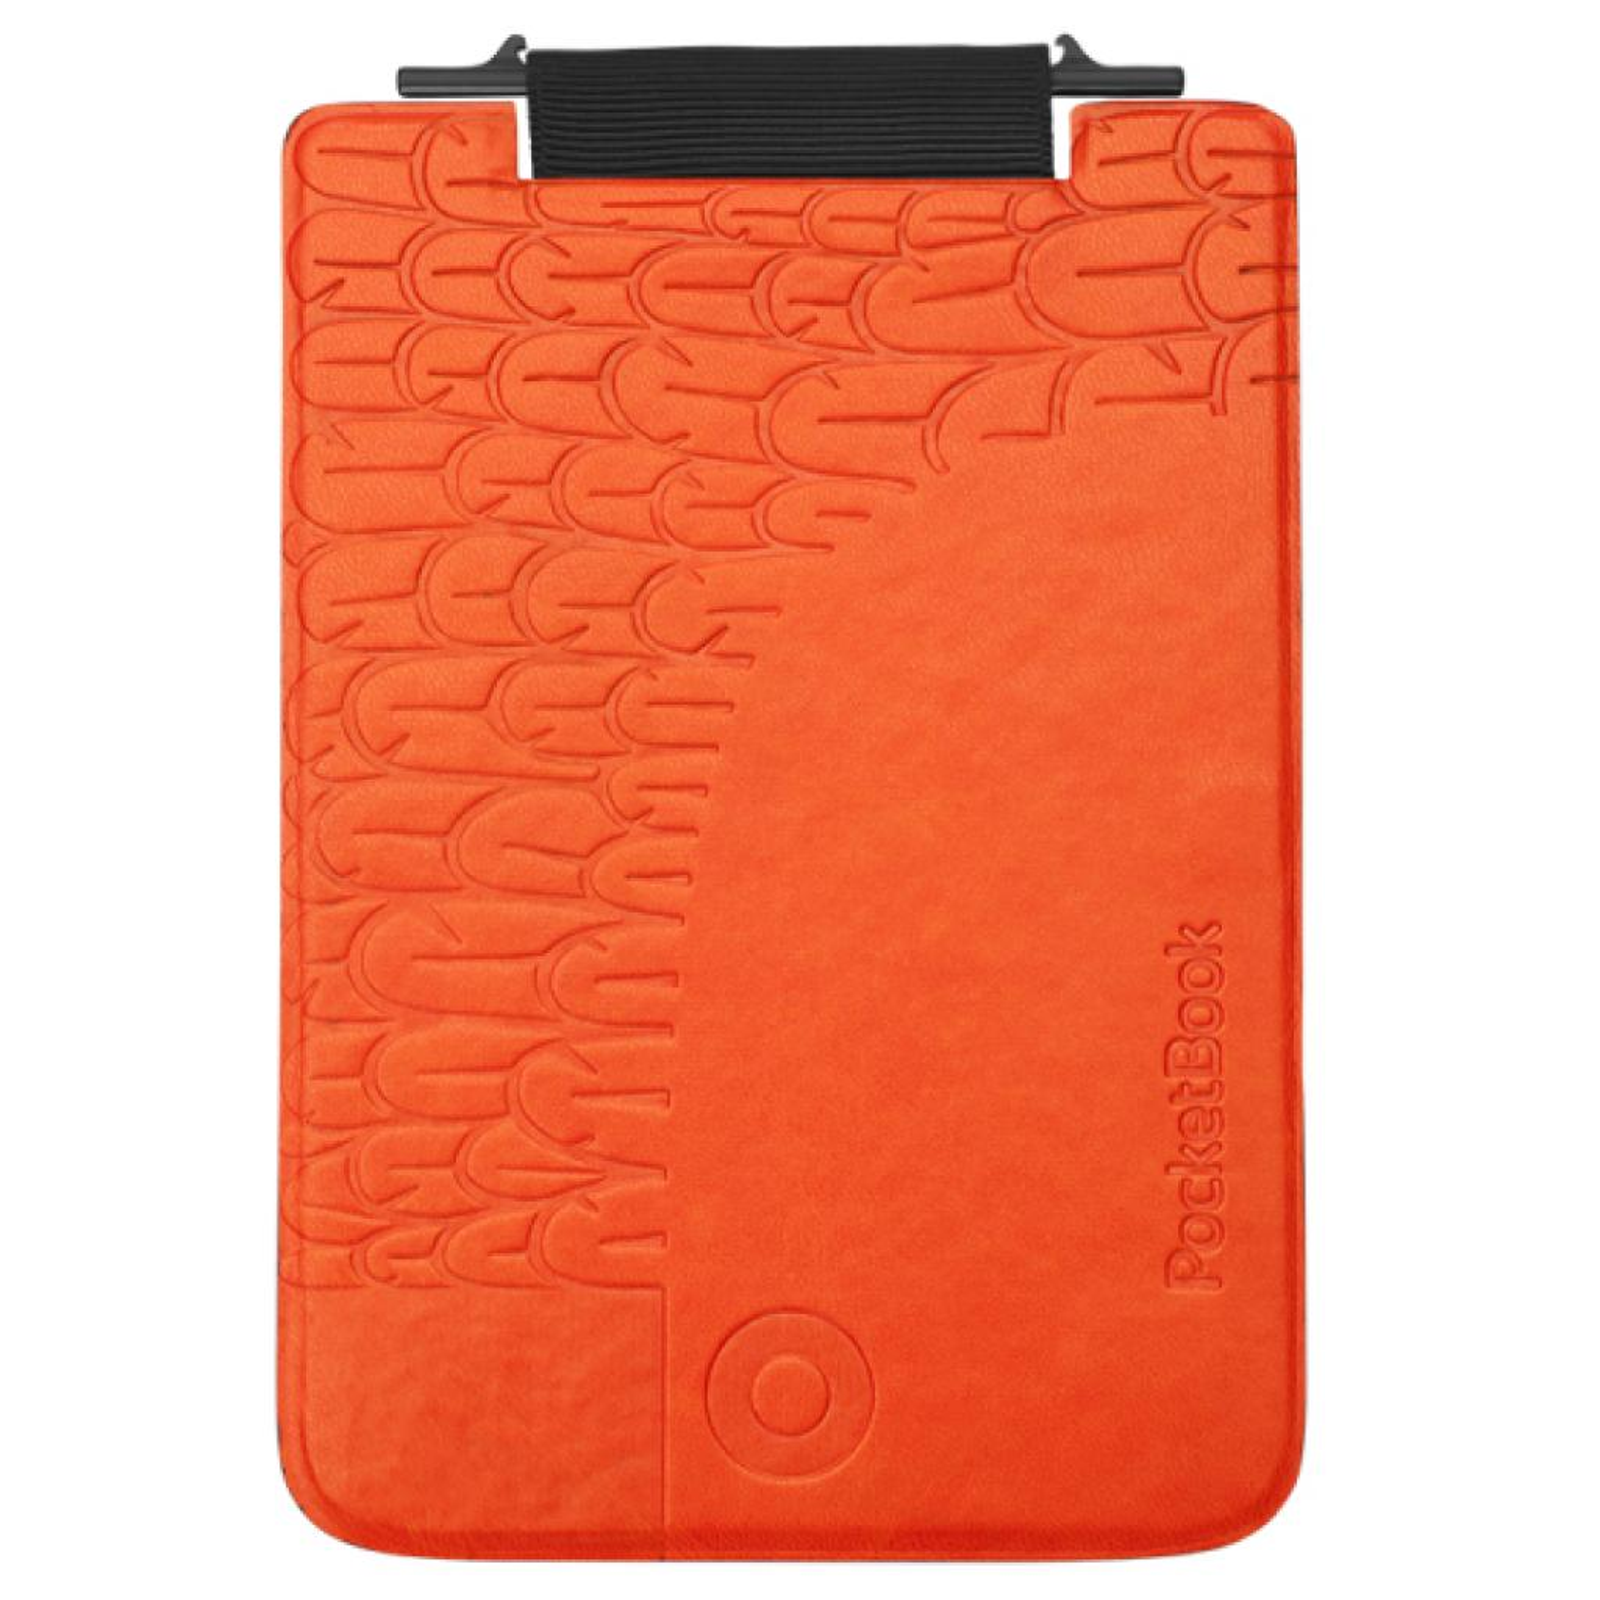 Чехол для электронной книги PocketBook PB515 Mini Bird orange/black (PBPUC-5-ORBC-BD)